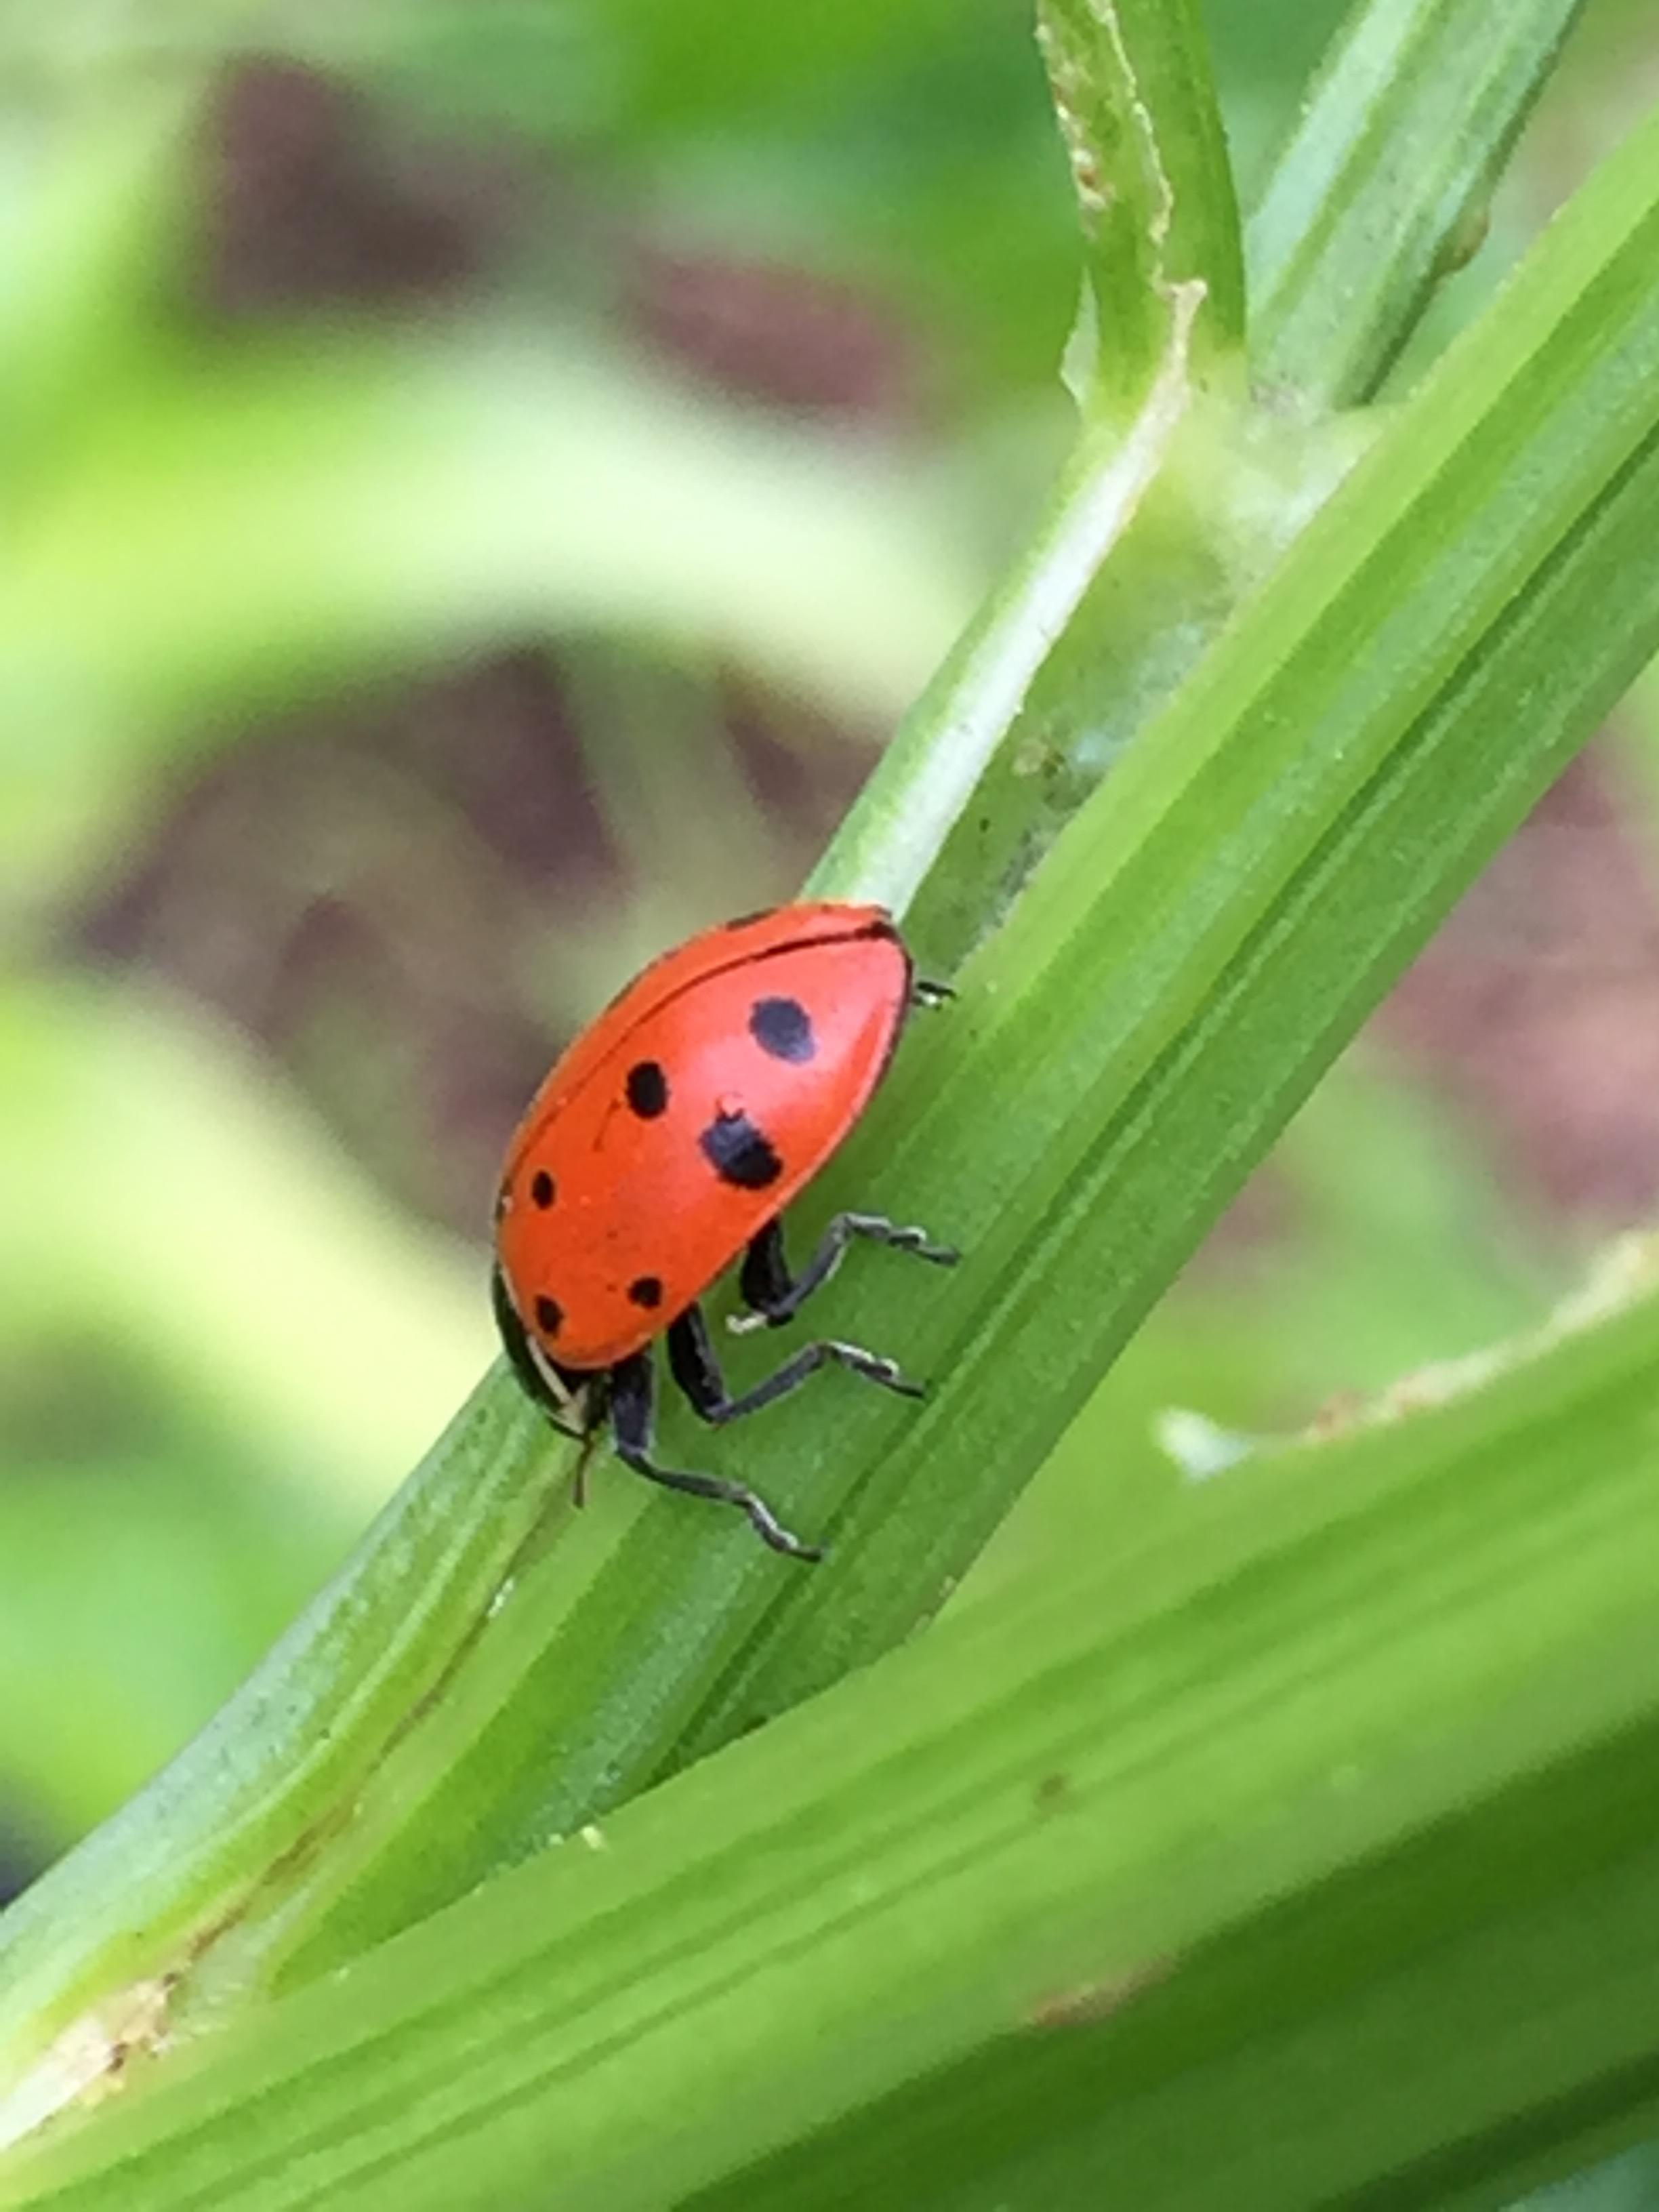 a ladybug on some celery at the Benicia Community Farm